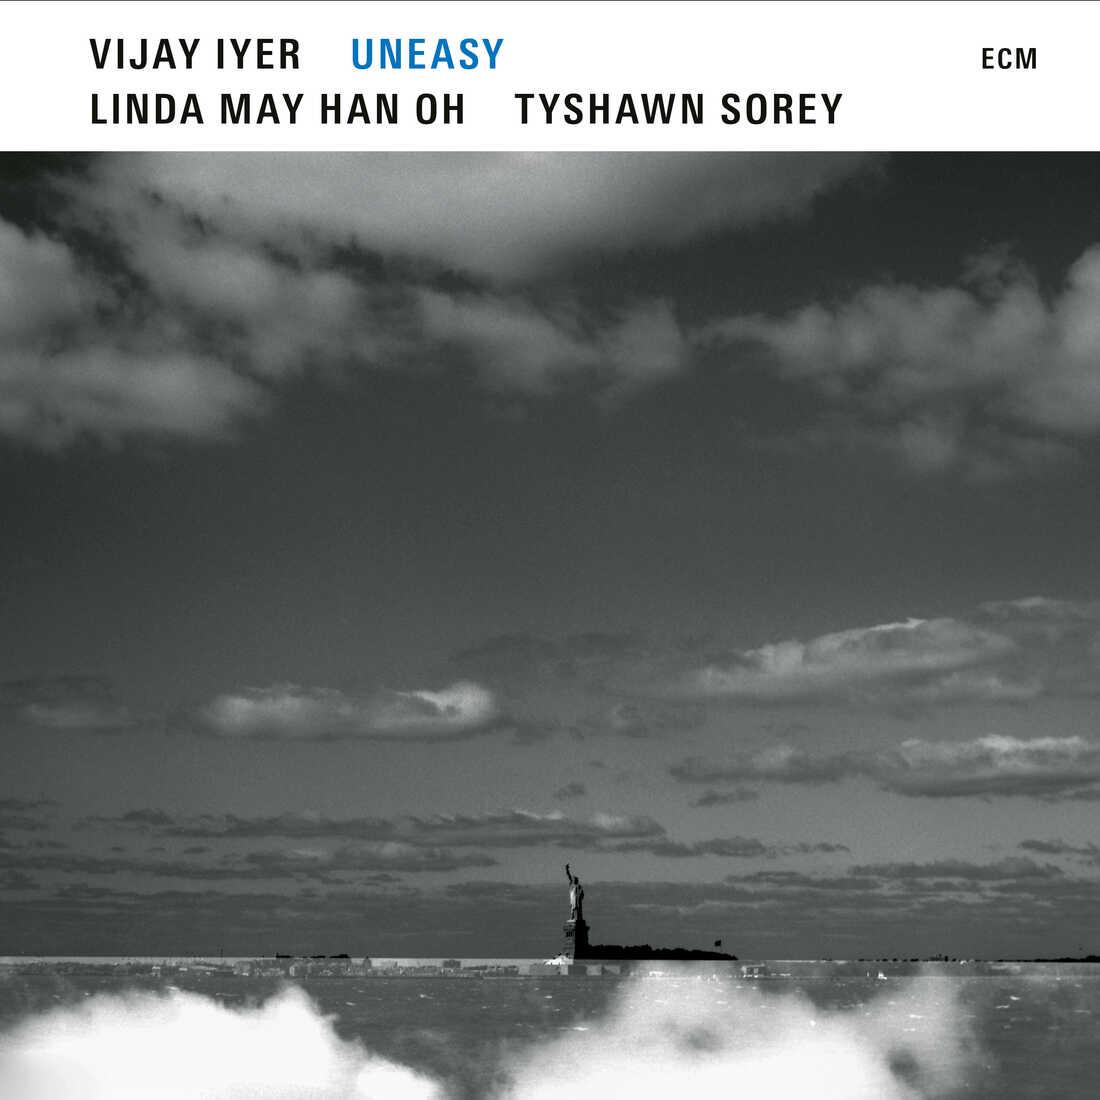 Vijay Iyer, Uneasy